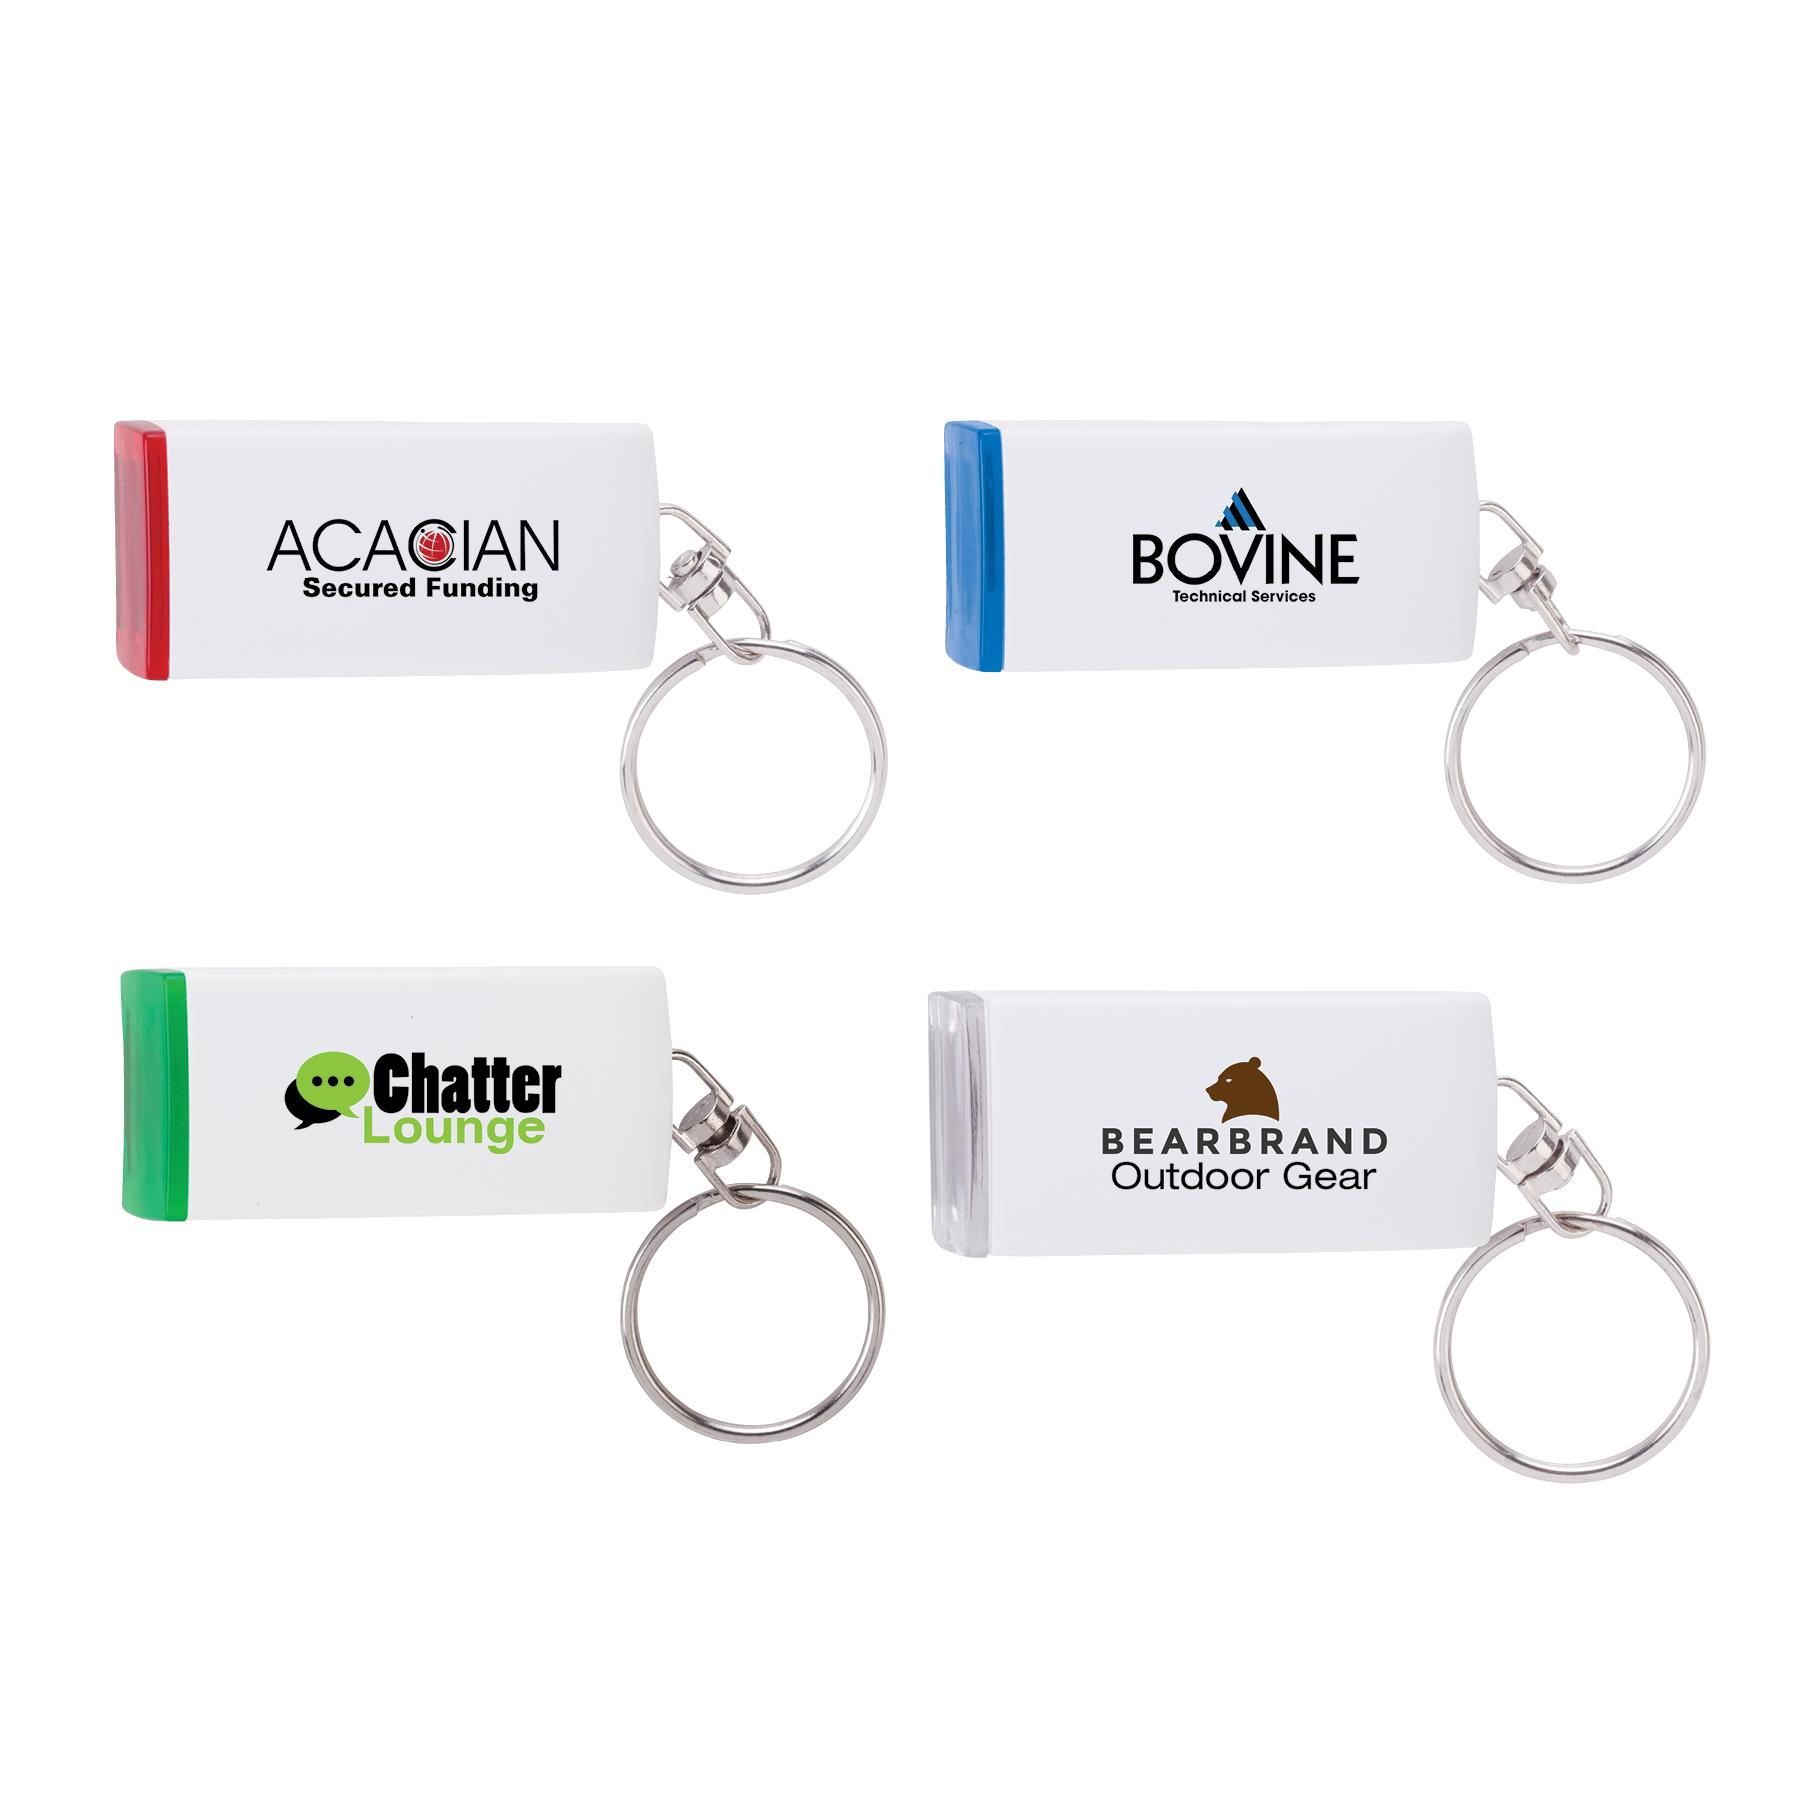 3-in-1 Keychain